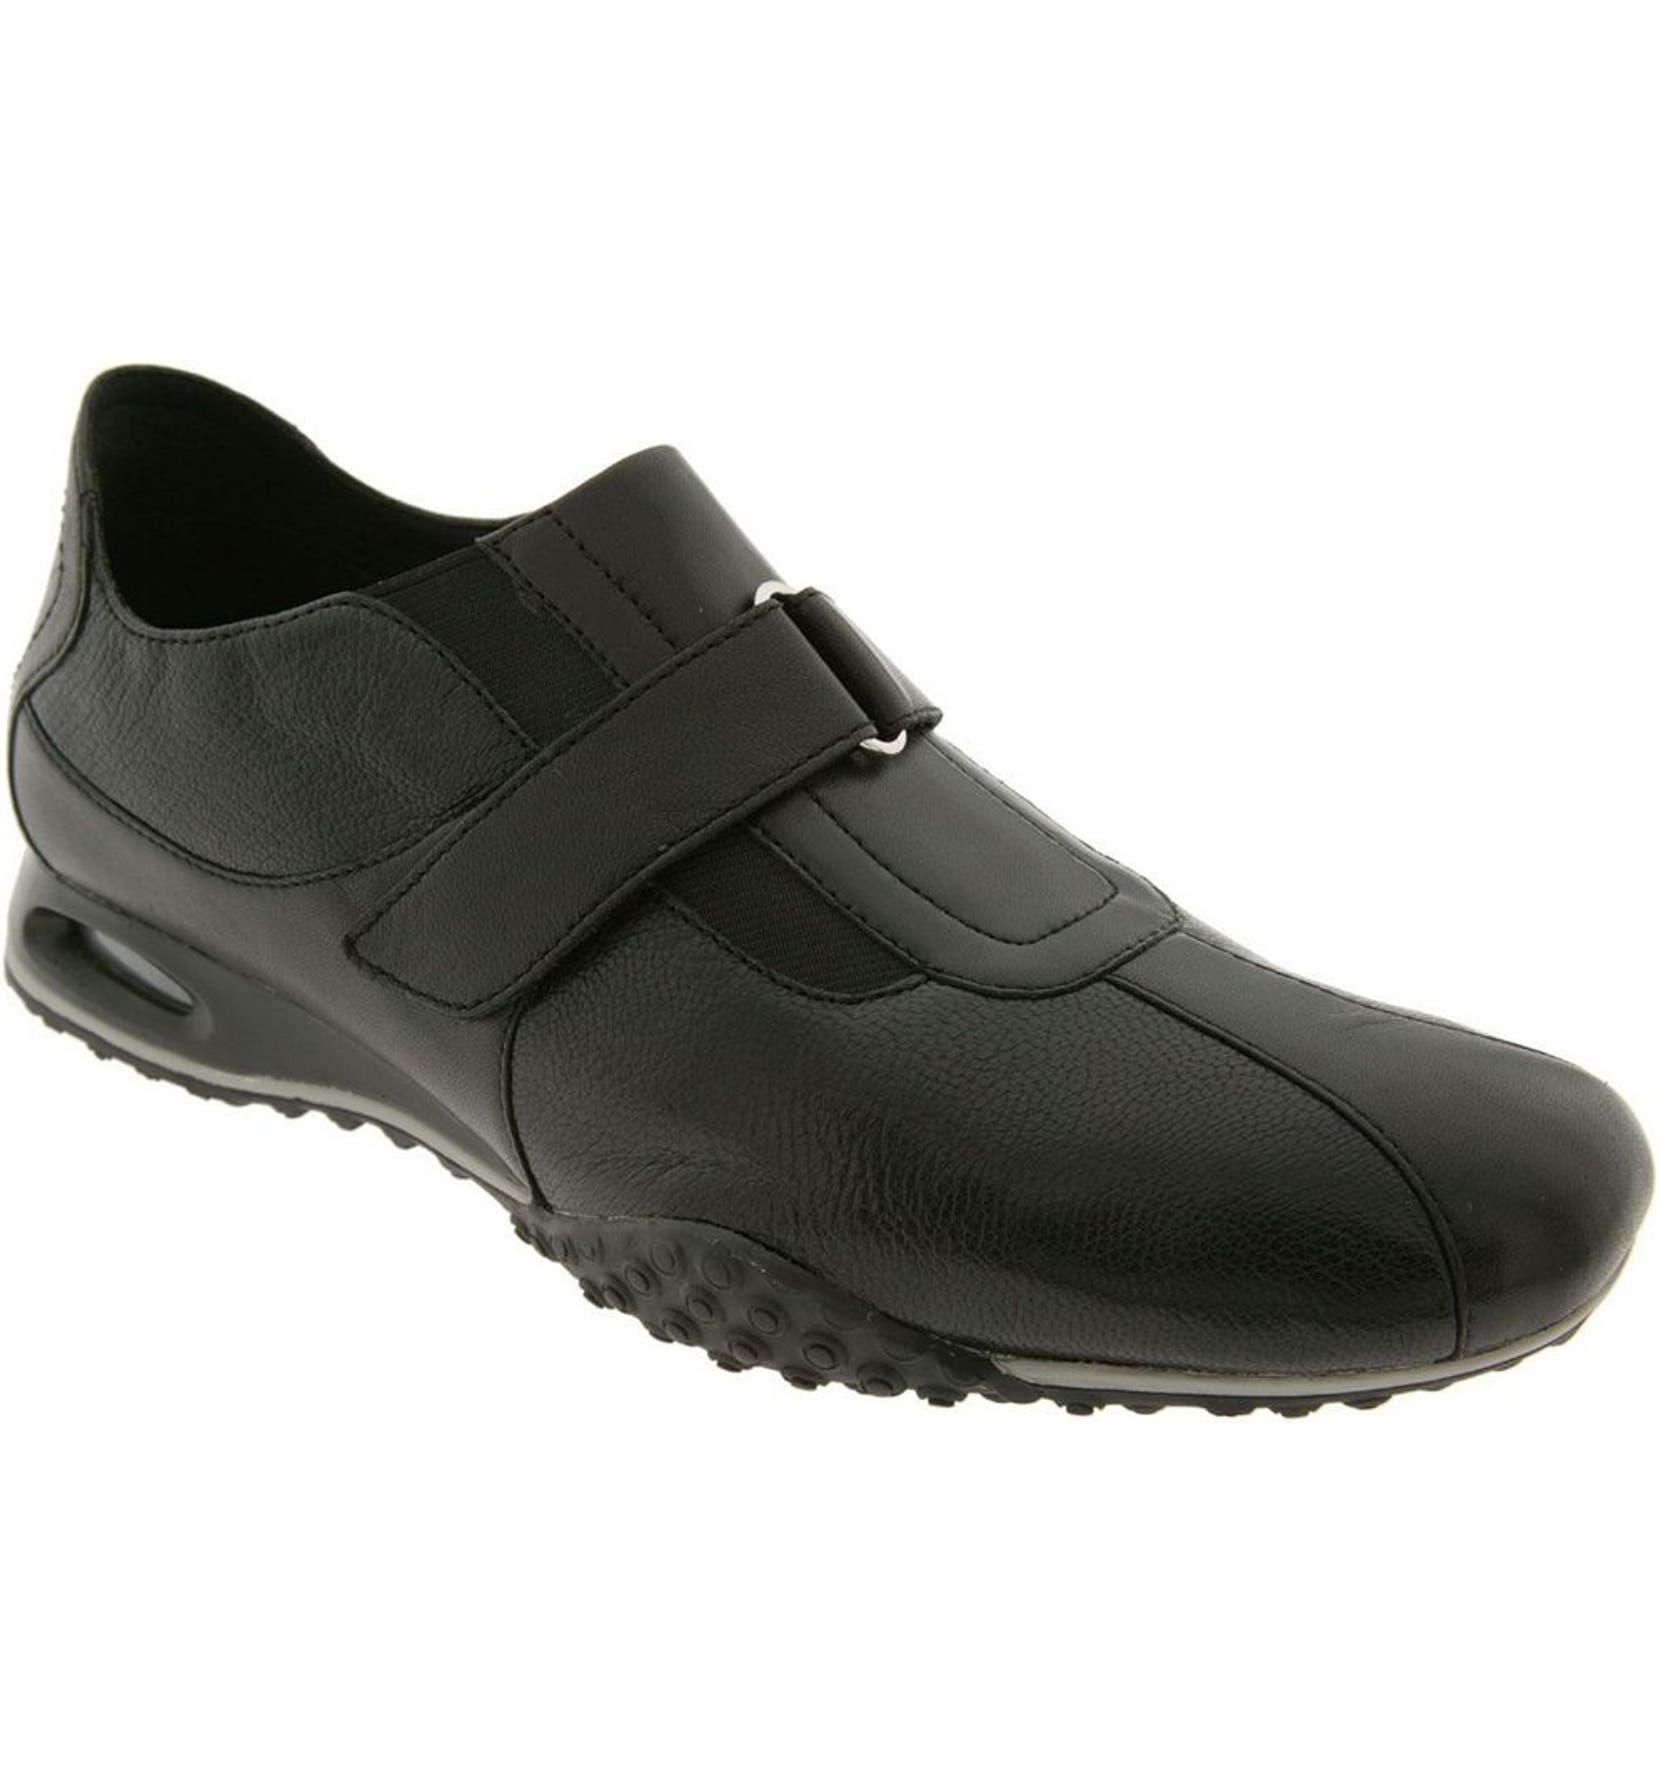 98ca7f3e47 Cole Haan 'Air Estadio Strap' Sneaker (Men) | Nordstrom